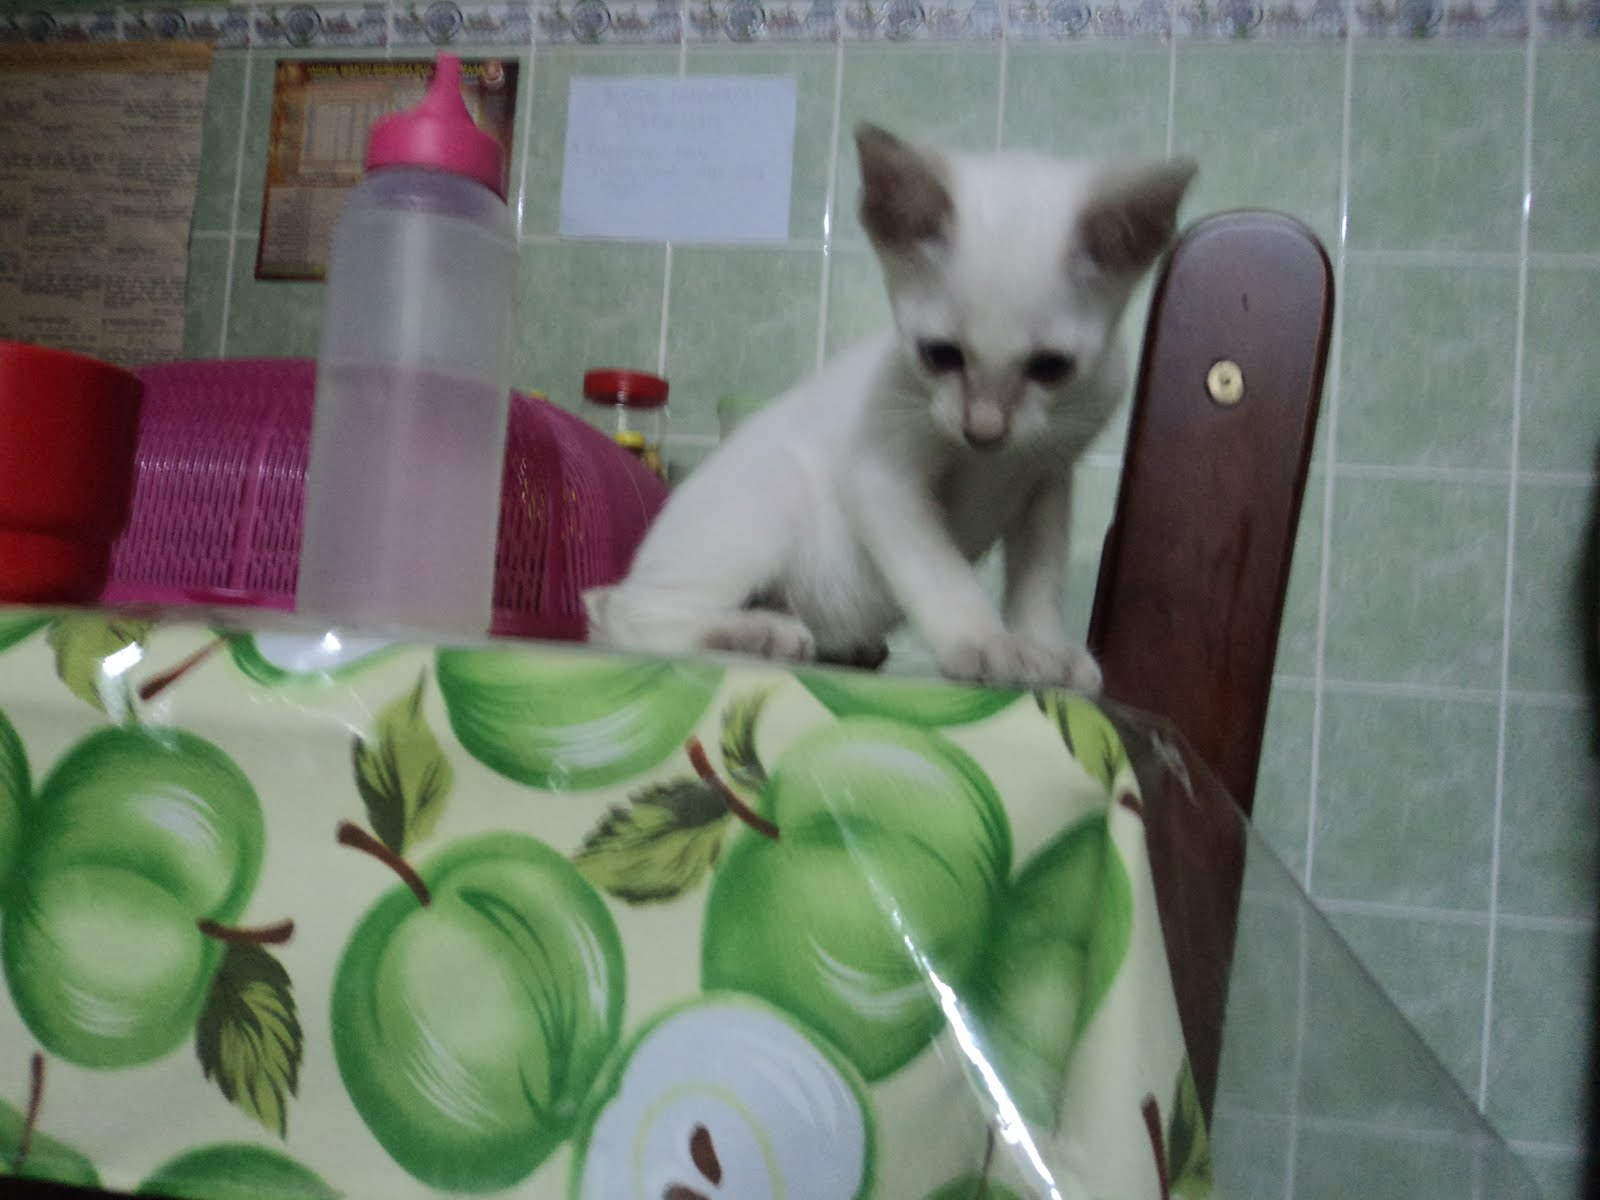 Exceladorable Tendencies Tshirt Yuck Cat Hitam S Posted